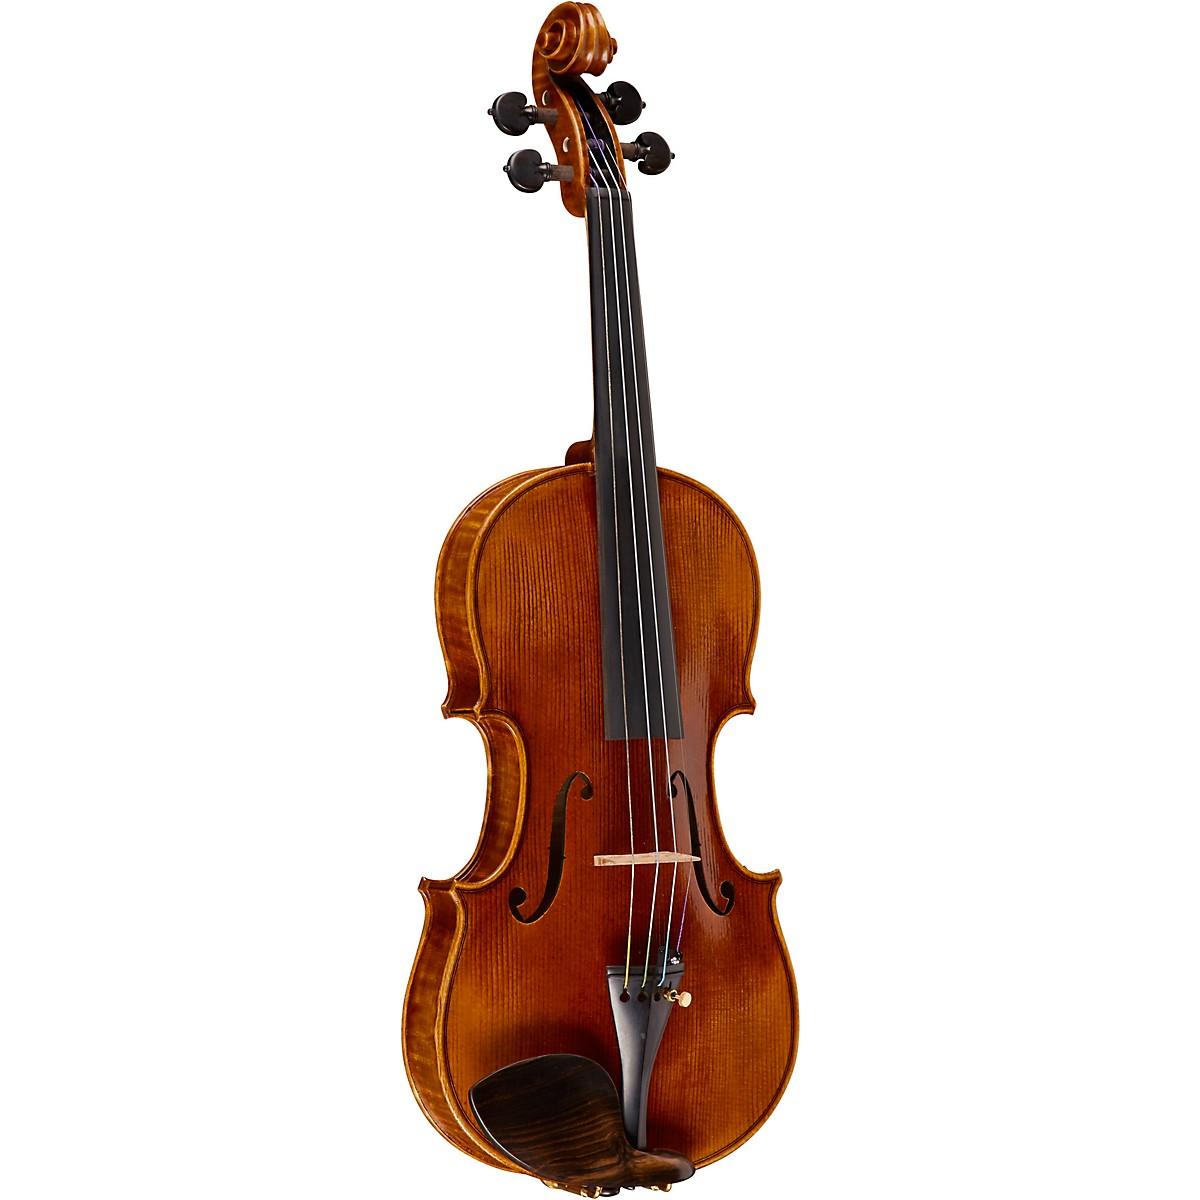 Ren Wei Shi Artist Model 2 Violin